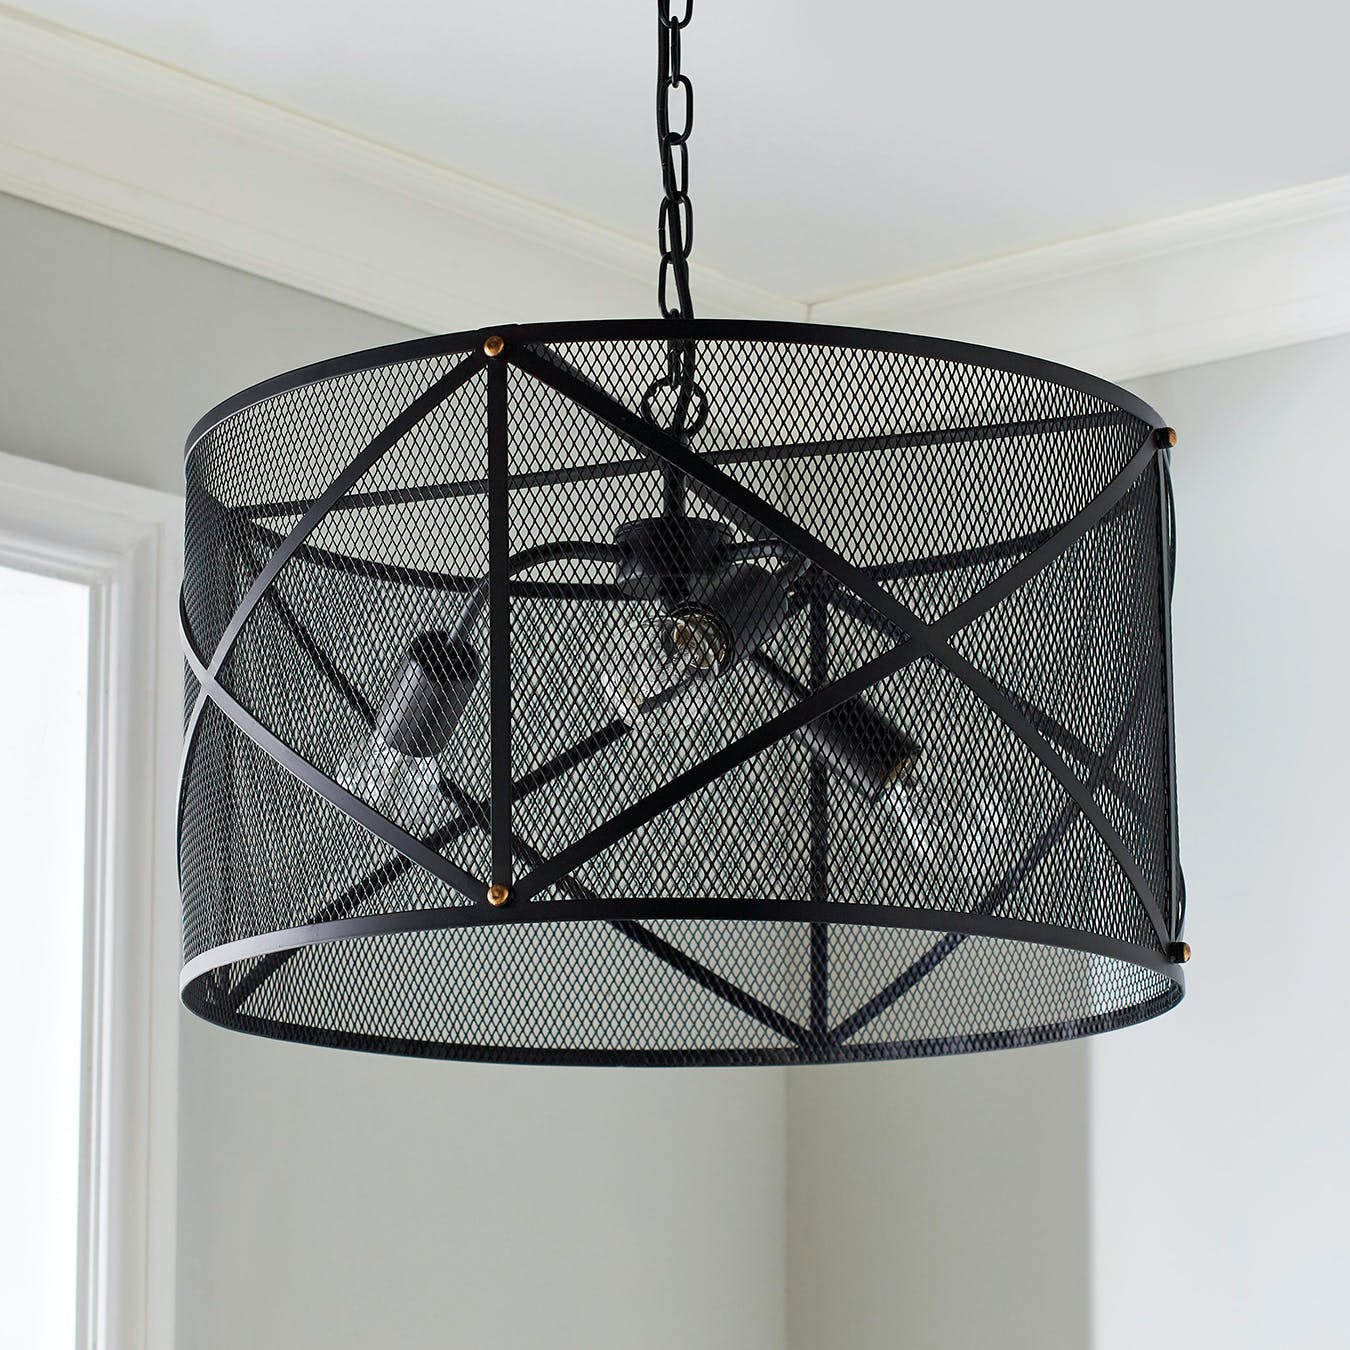 Wilko   Cage pendant light, Pendant